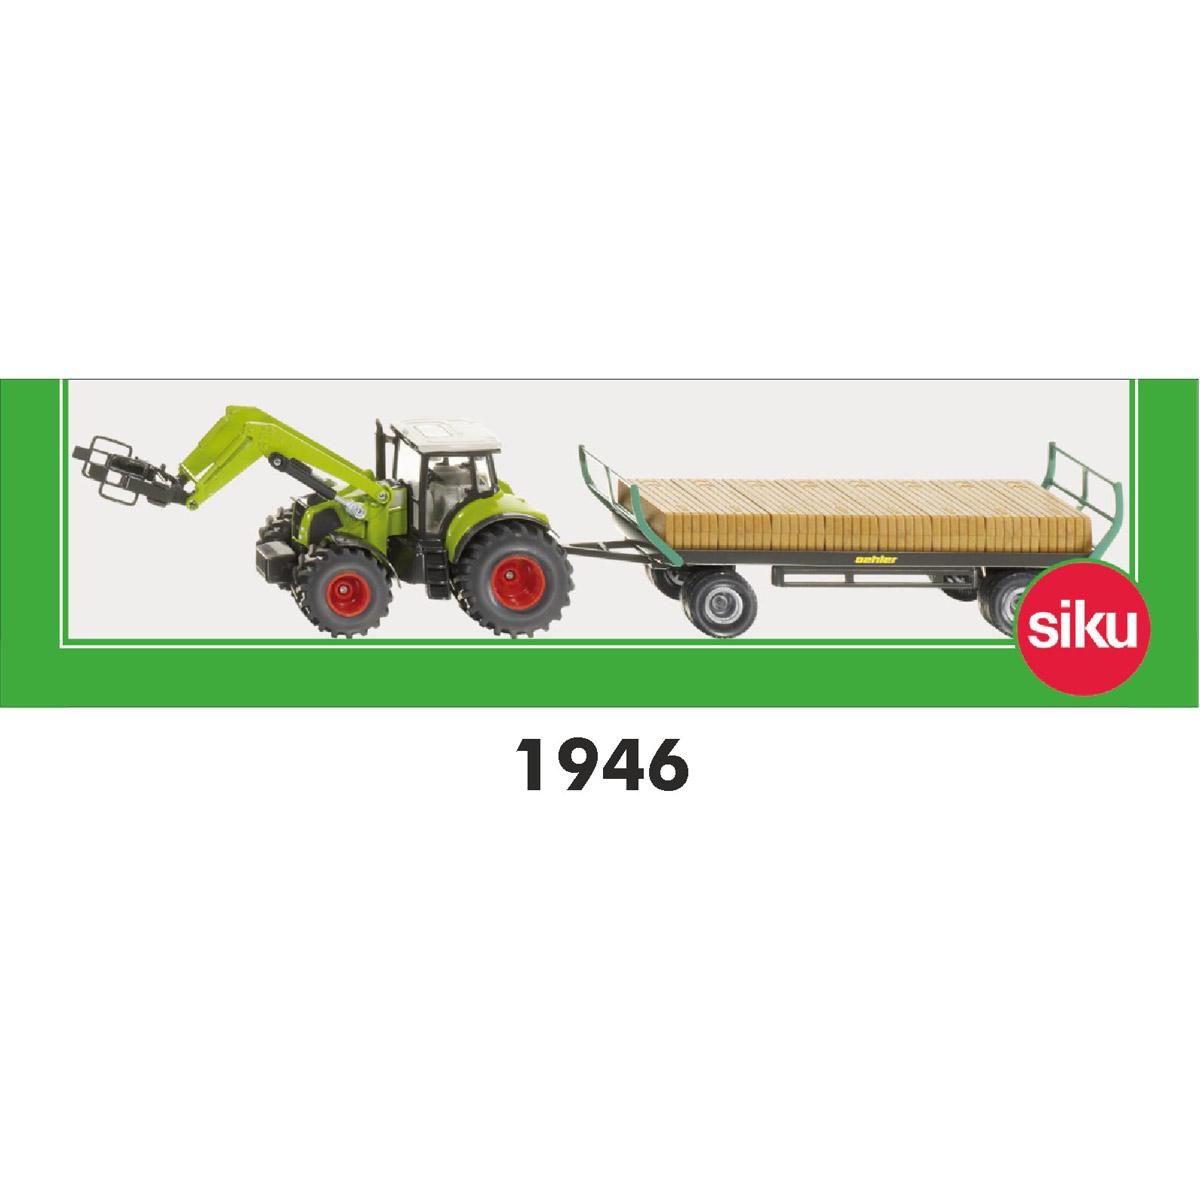 Siku Traktor 1046